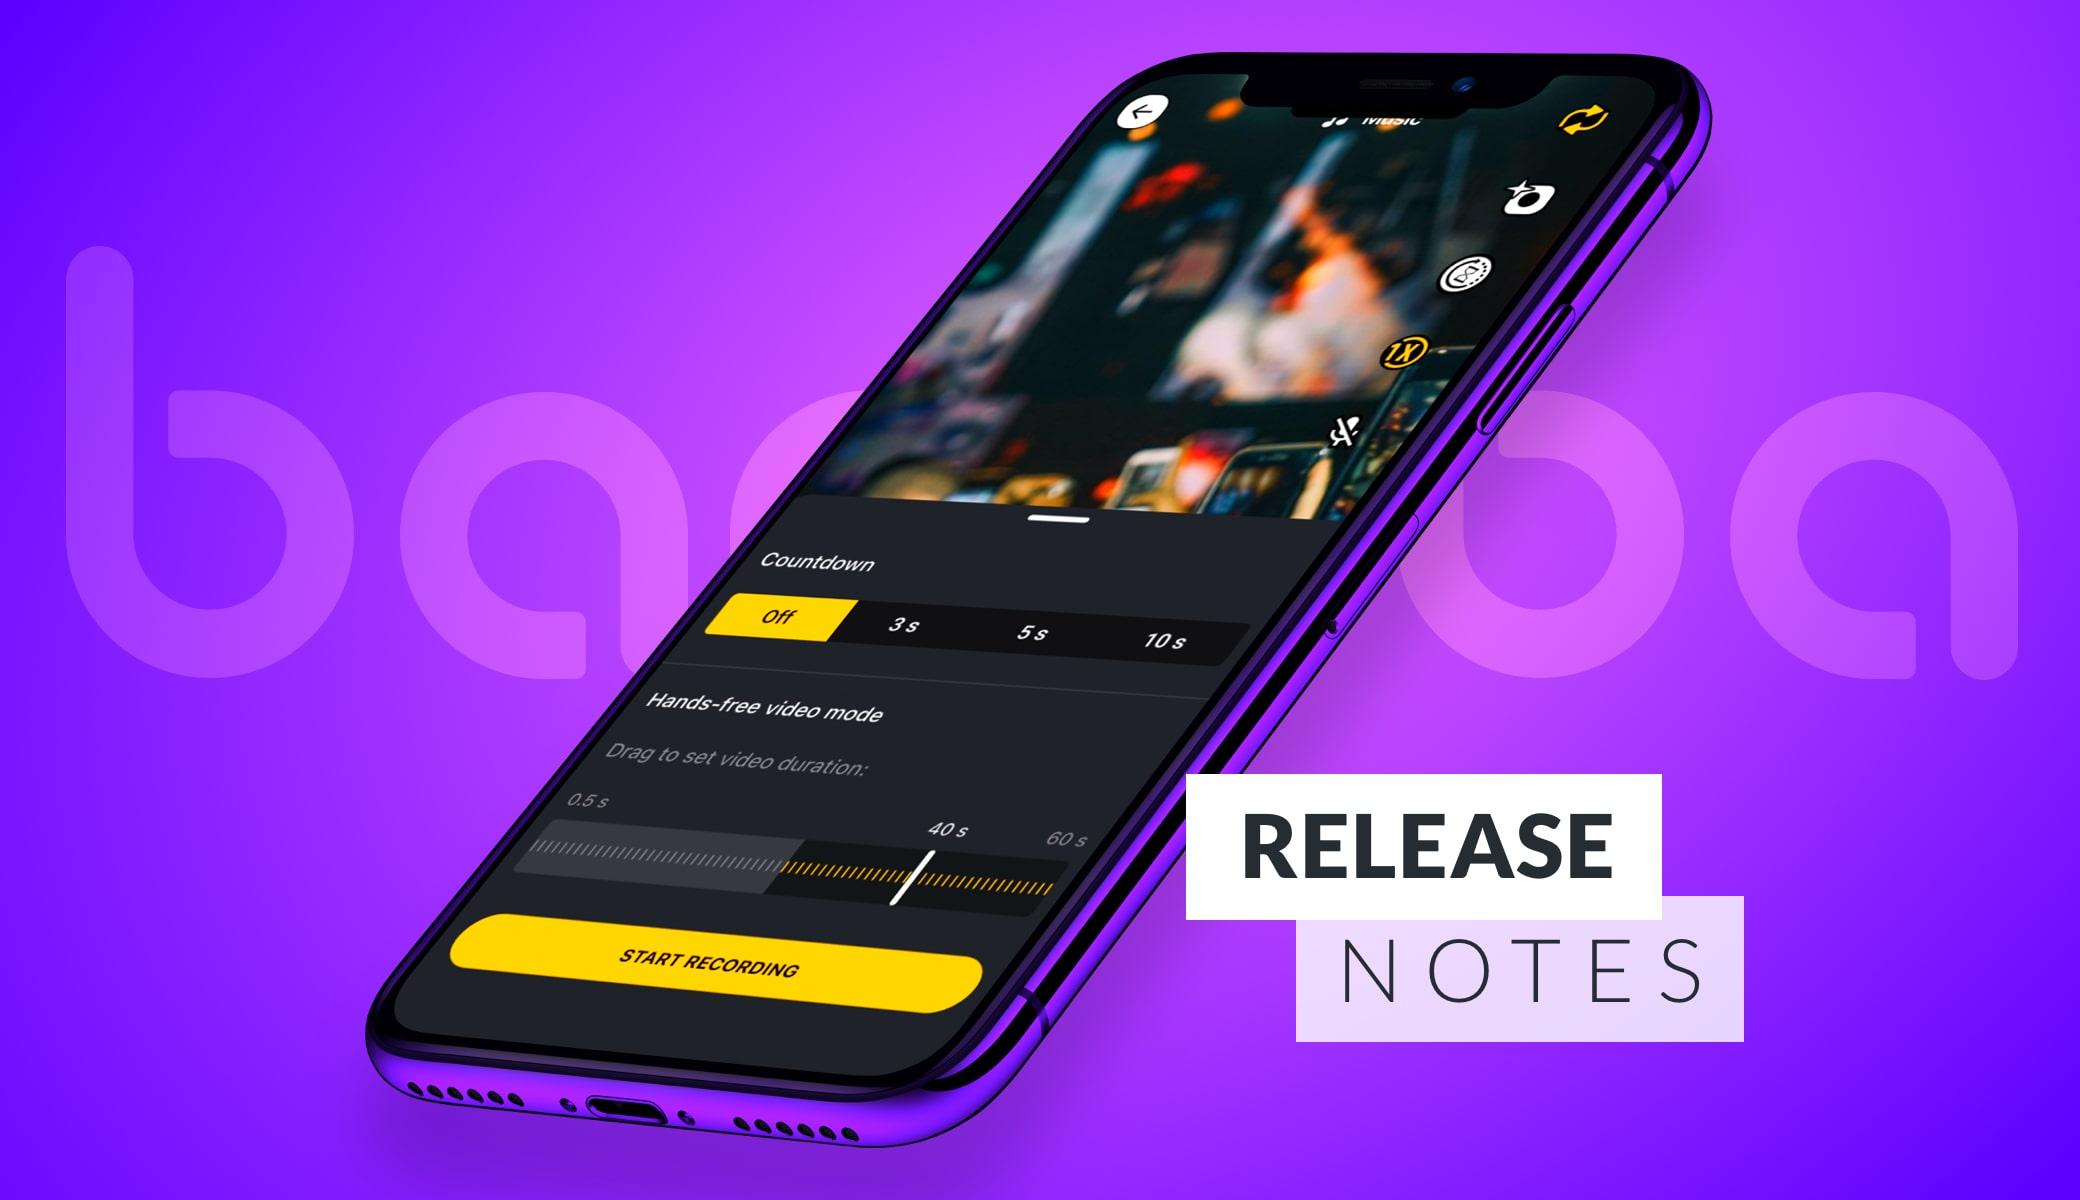 VE-SDK-Release-V-1-0-14-iOS-Video-Recording-&-Editing-Improvements